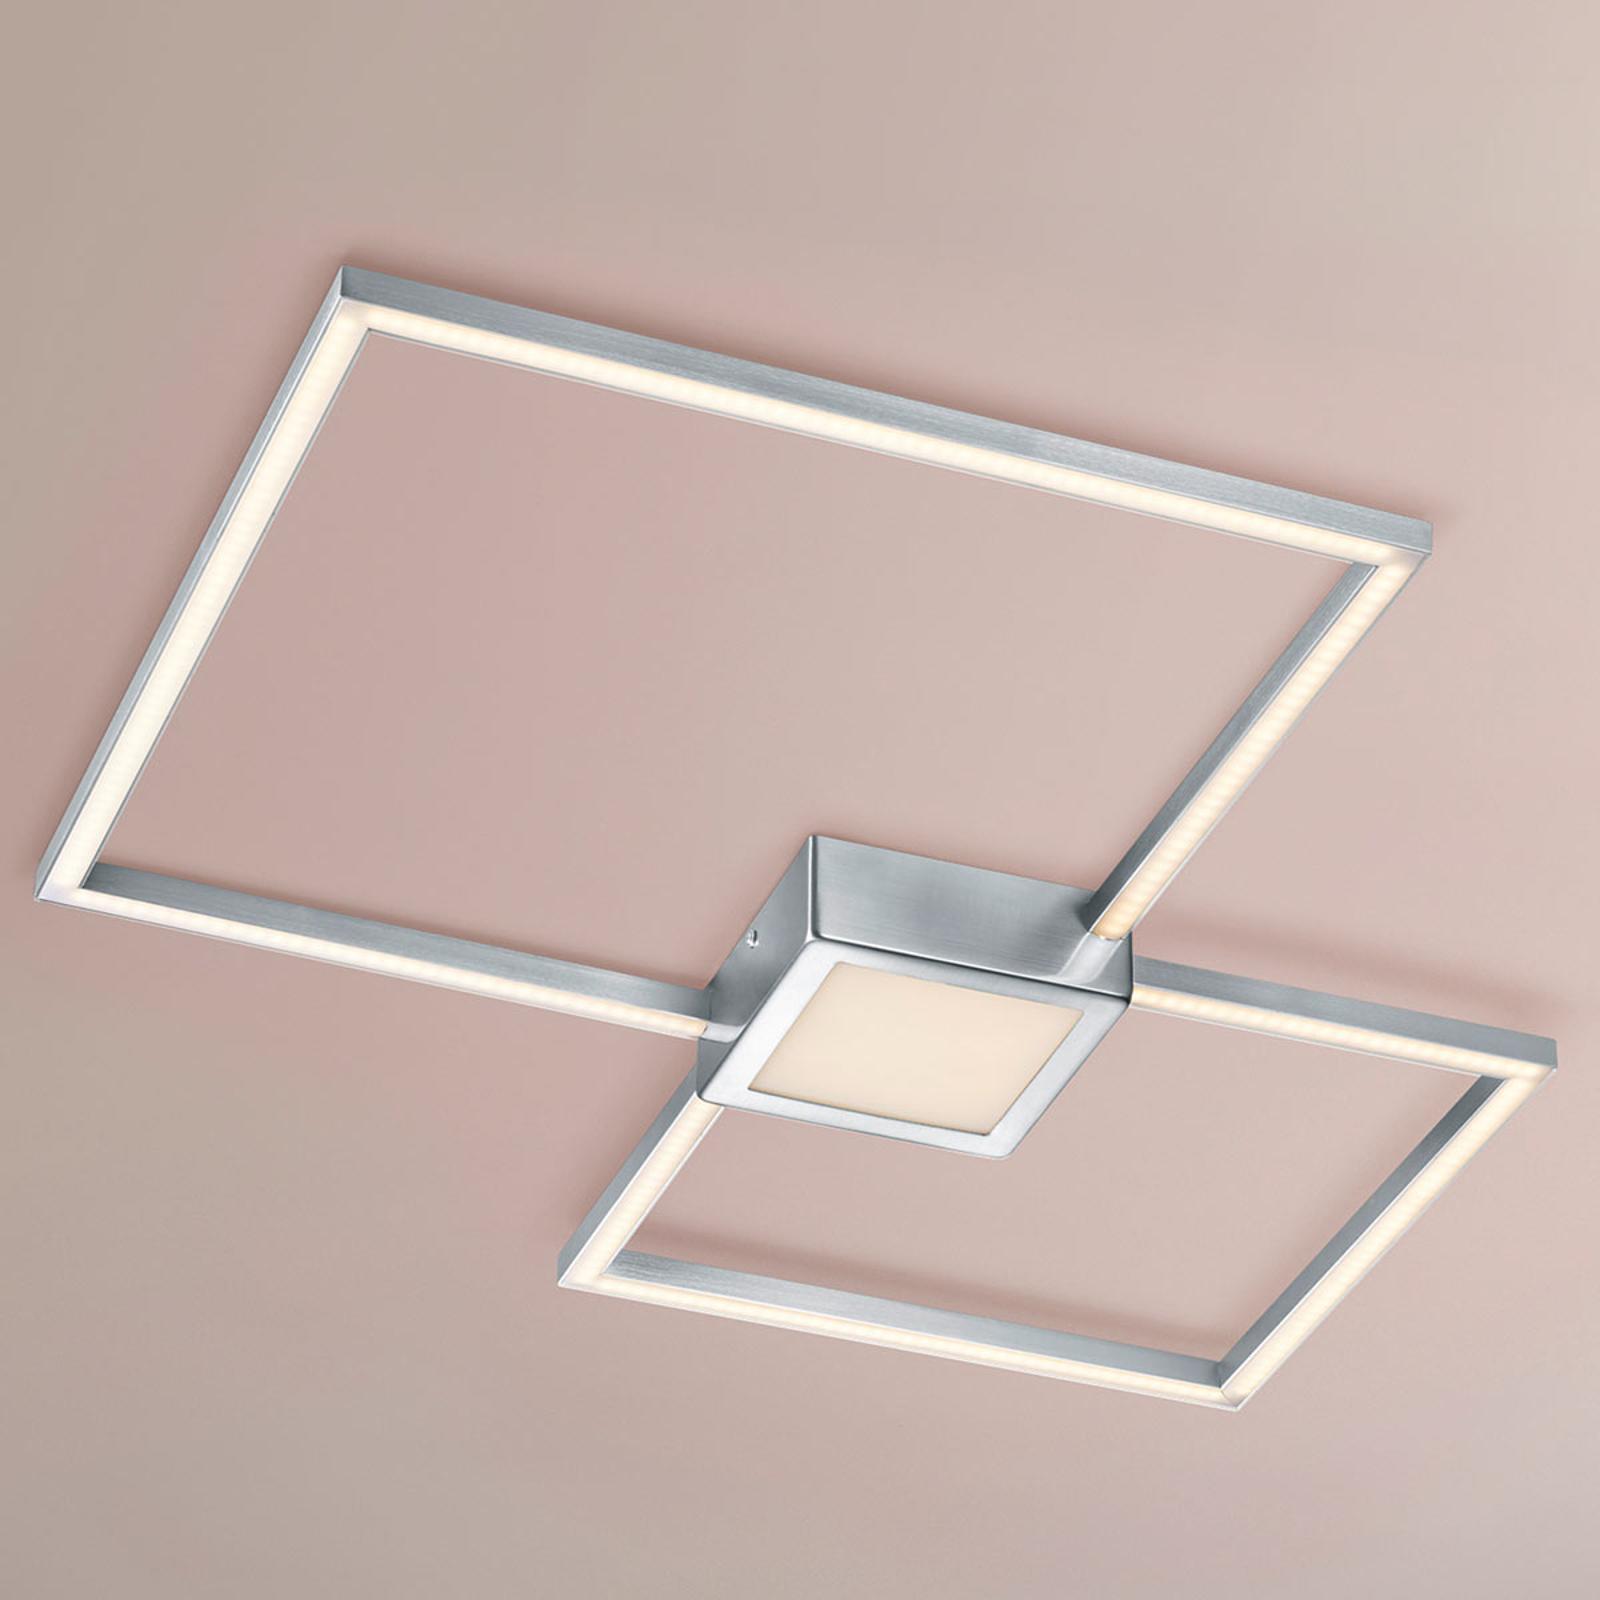 LED-Deckenlampe Hydra - dimmbar über Wandschalter